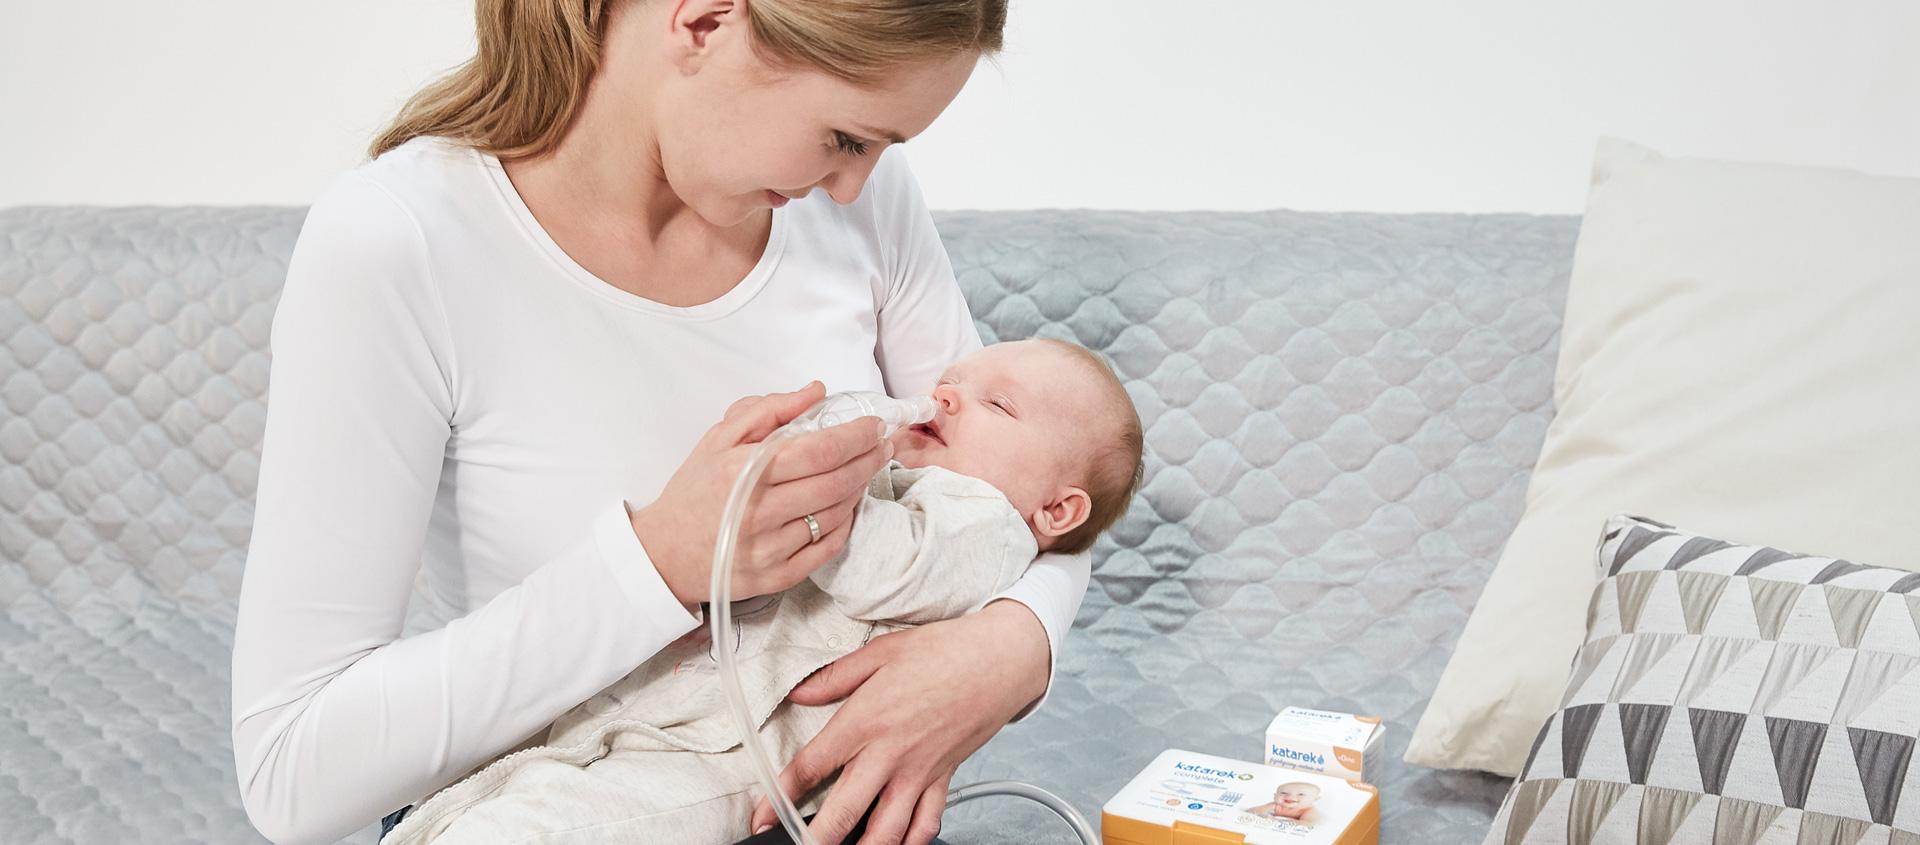 Odciąganie katarku niemowlęciu